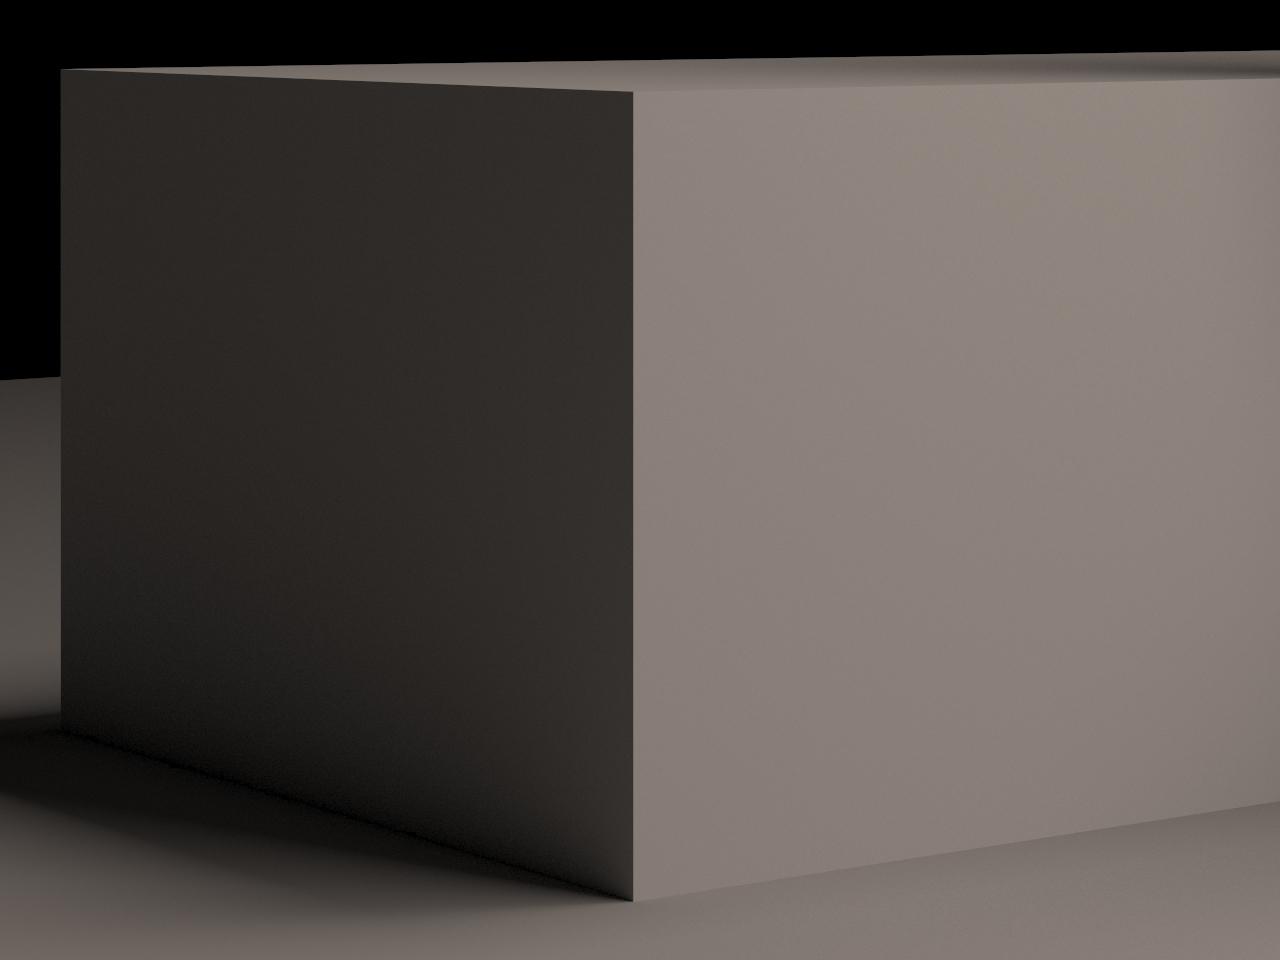 quicksetting.jpg.f4a332e8269ea767d2c53c6c8a8a2c0e.jpg